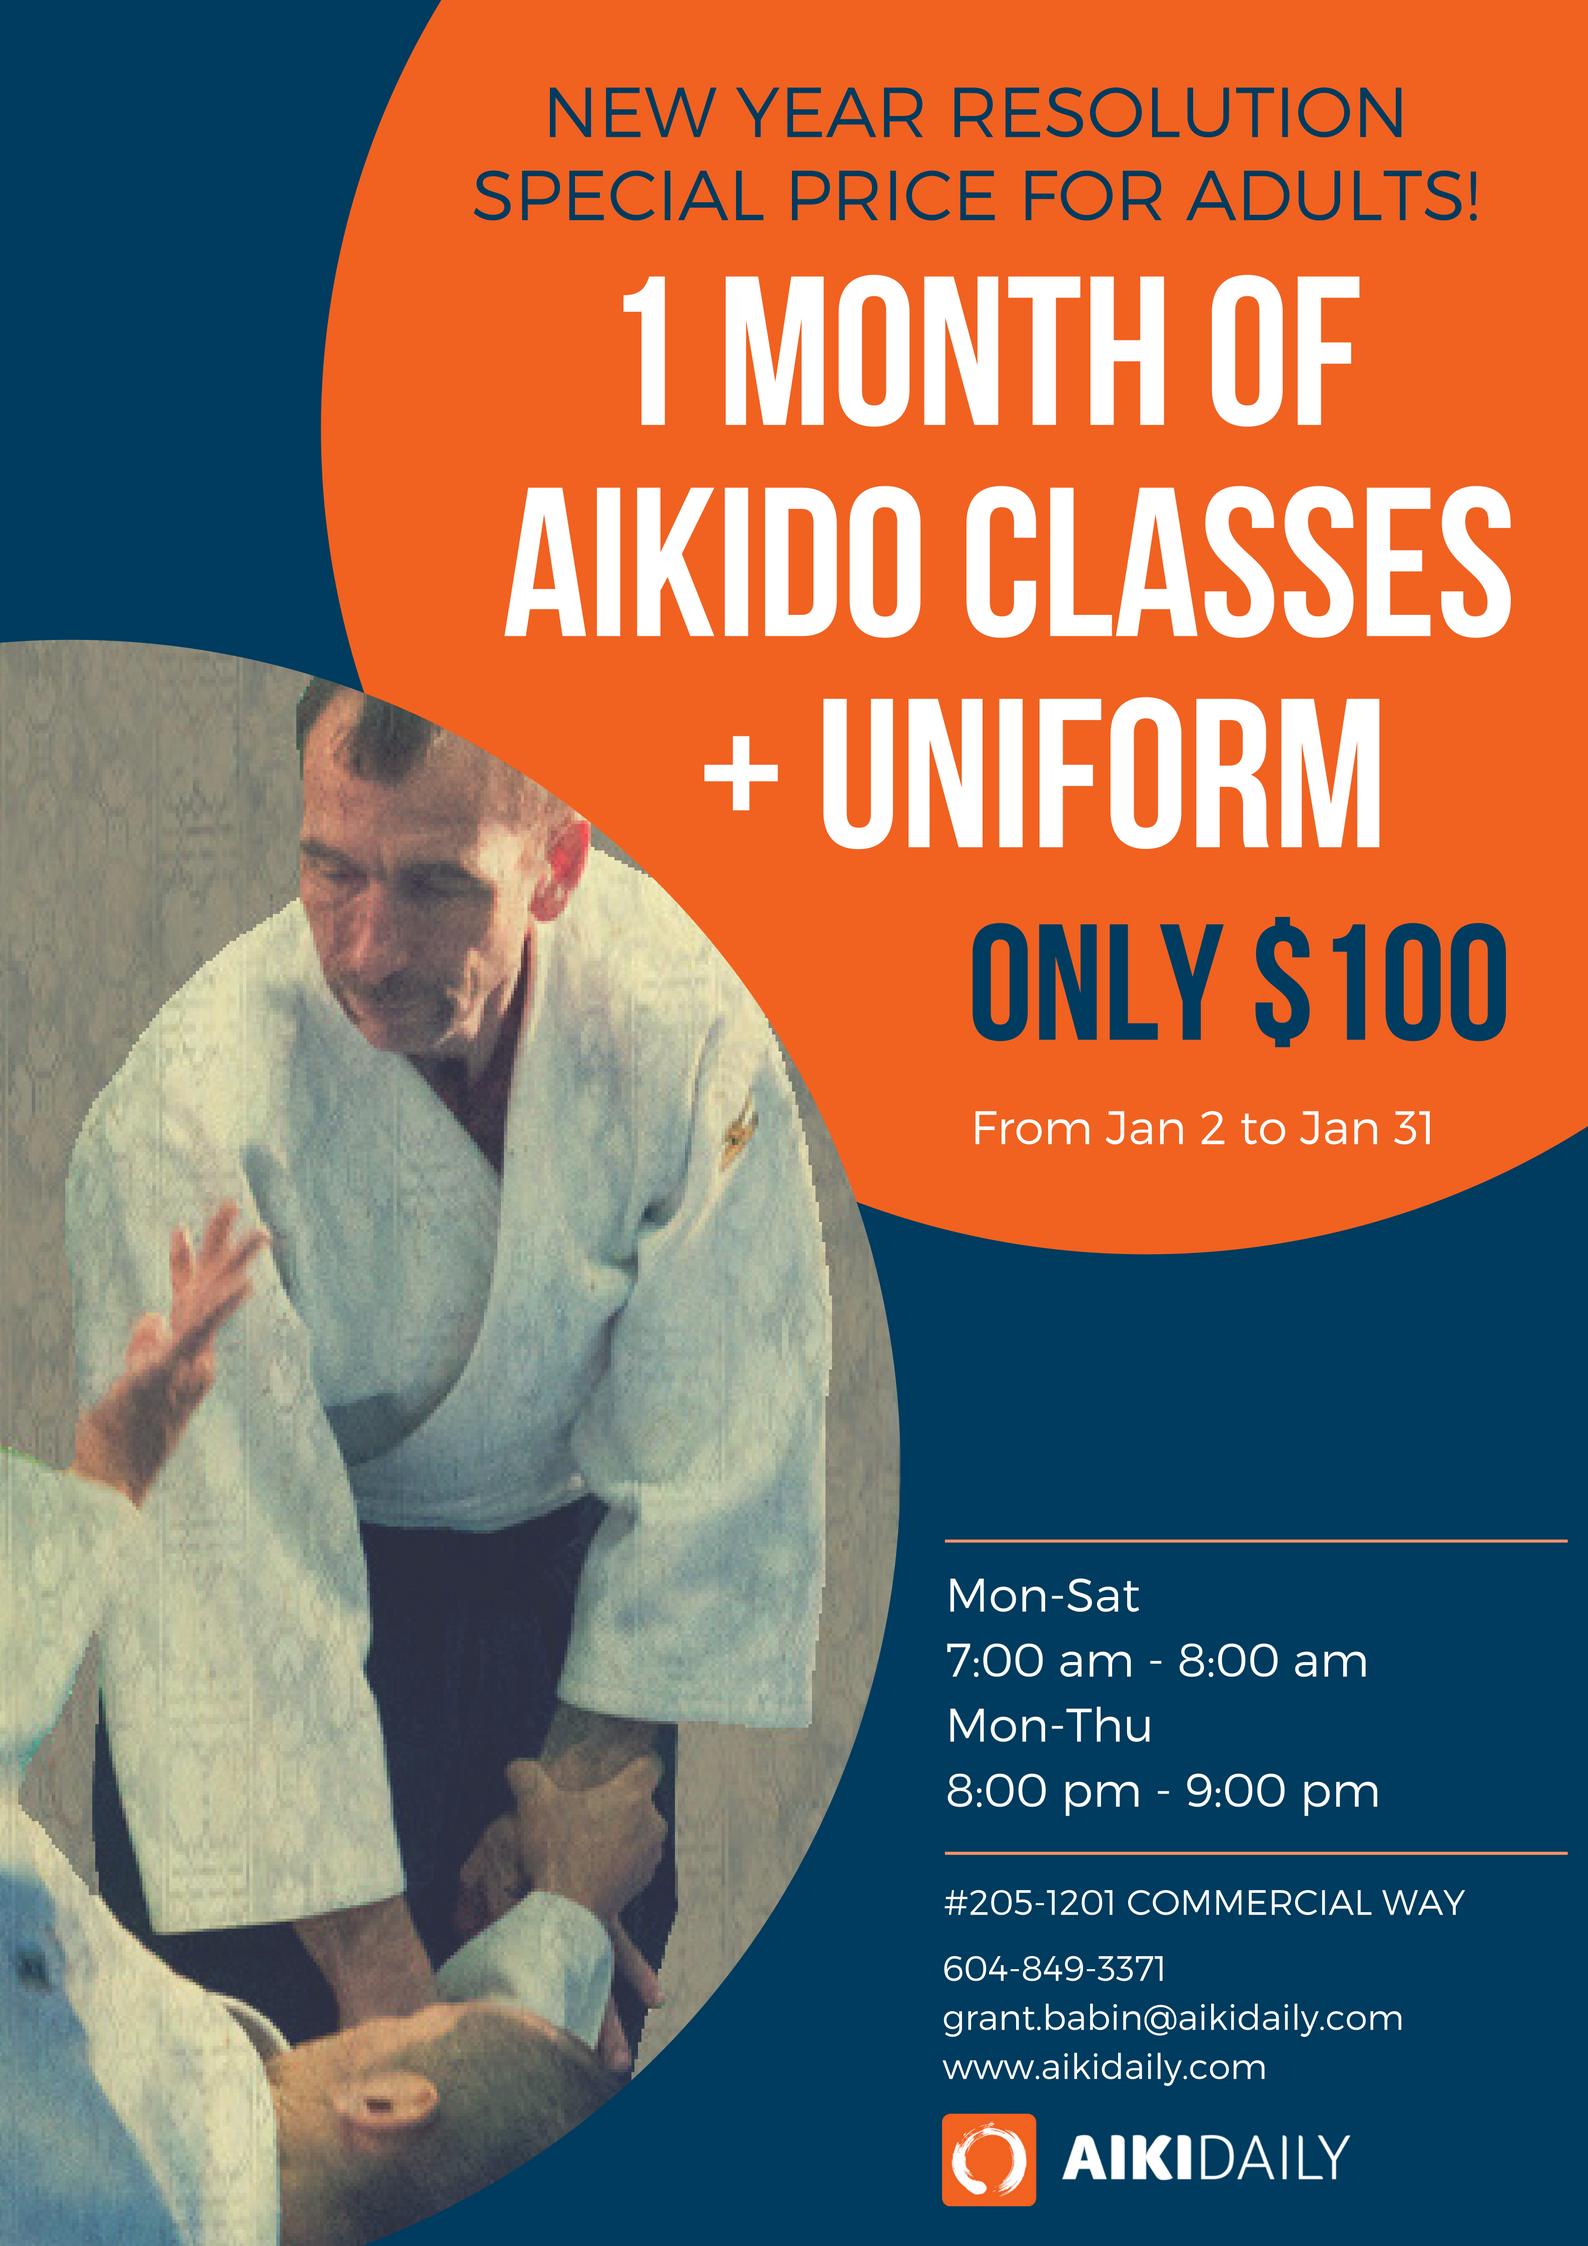 1 month free aikido + uniform.png